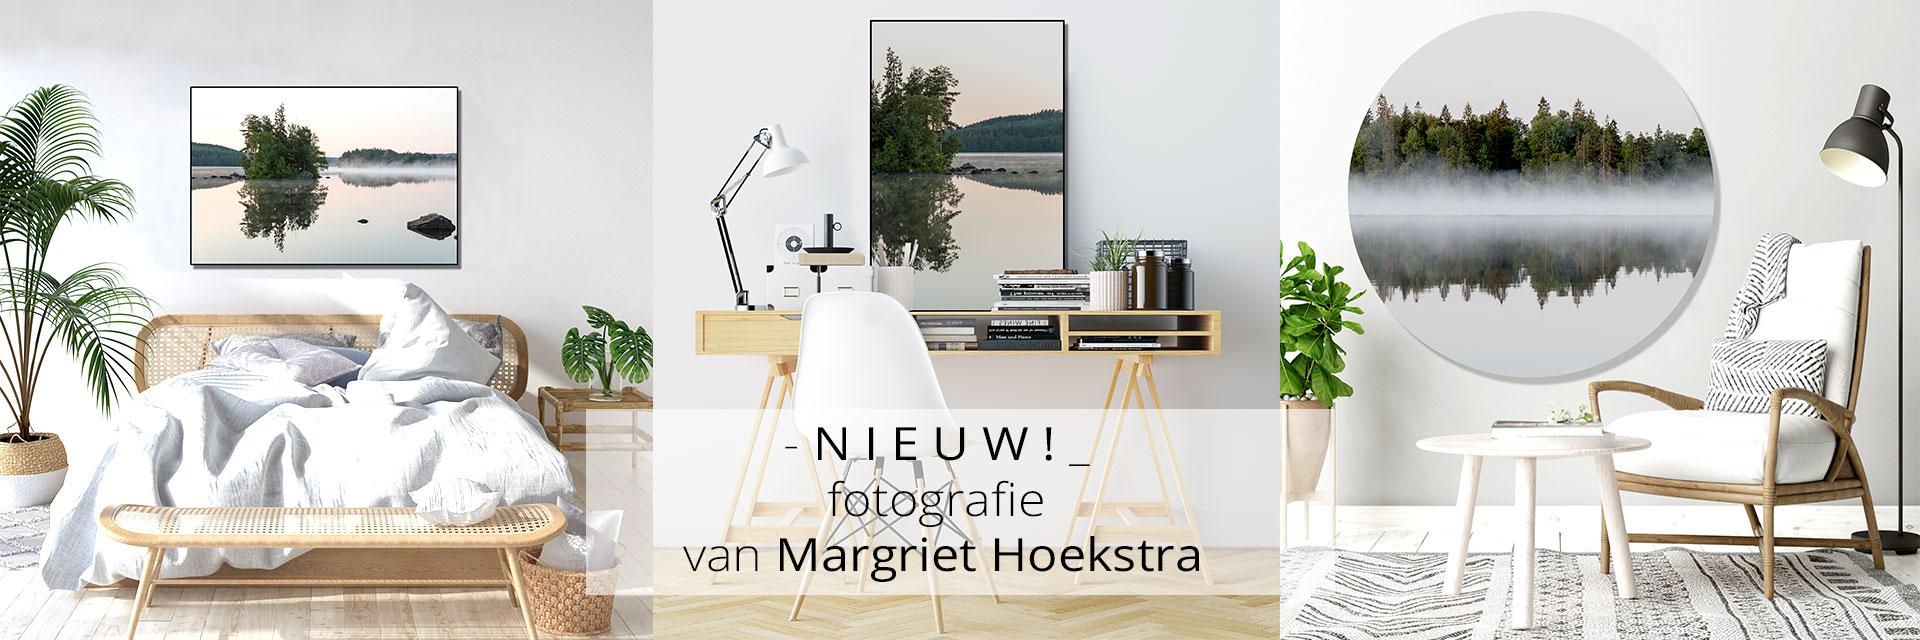 WANDenWOONdeco.nl Margriet Hoekstra fotografie